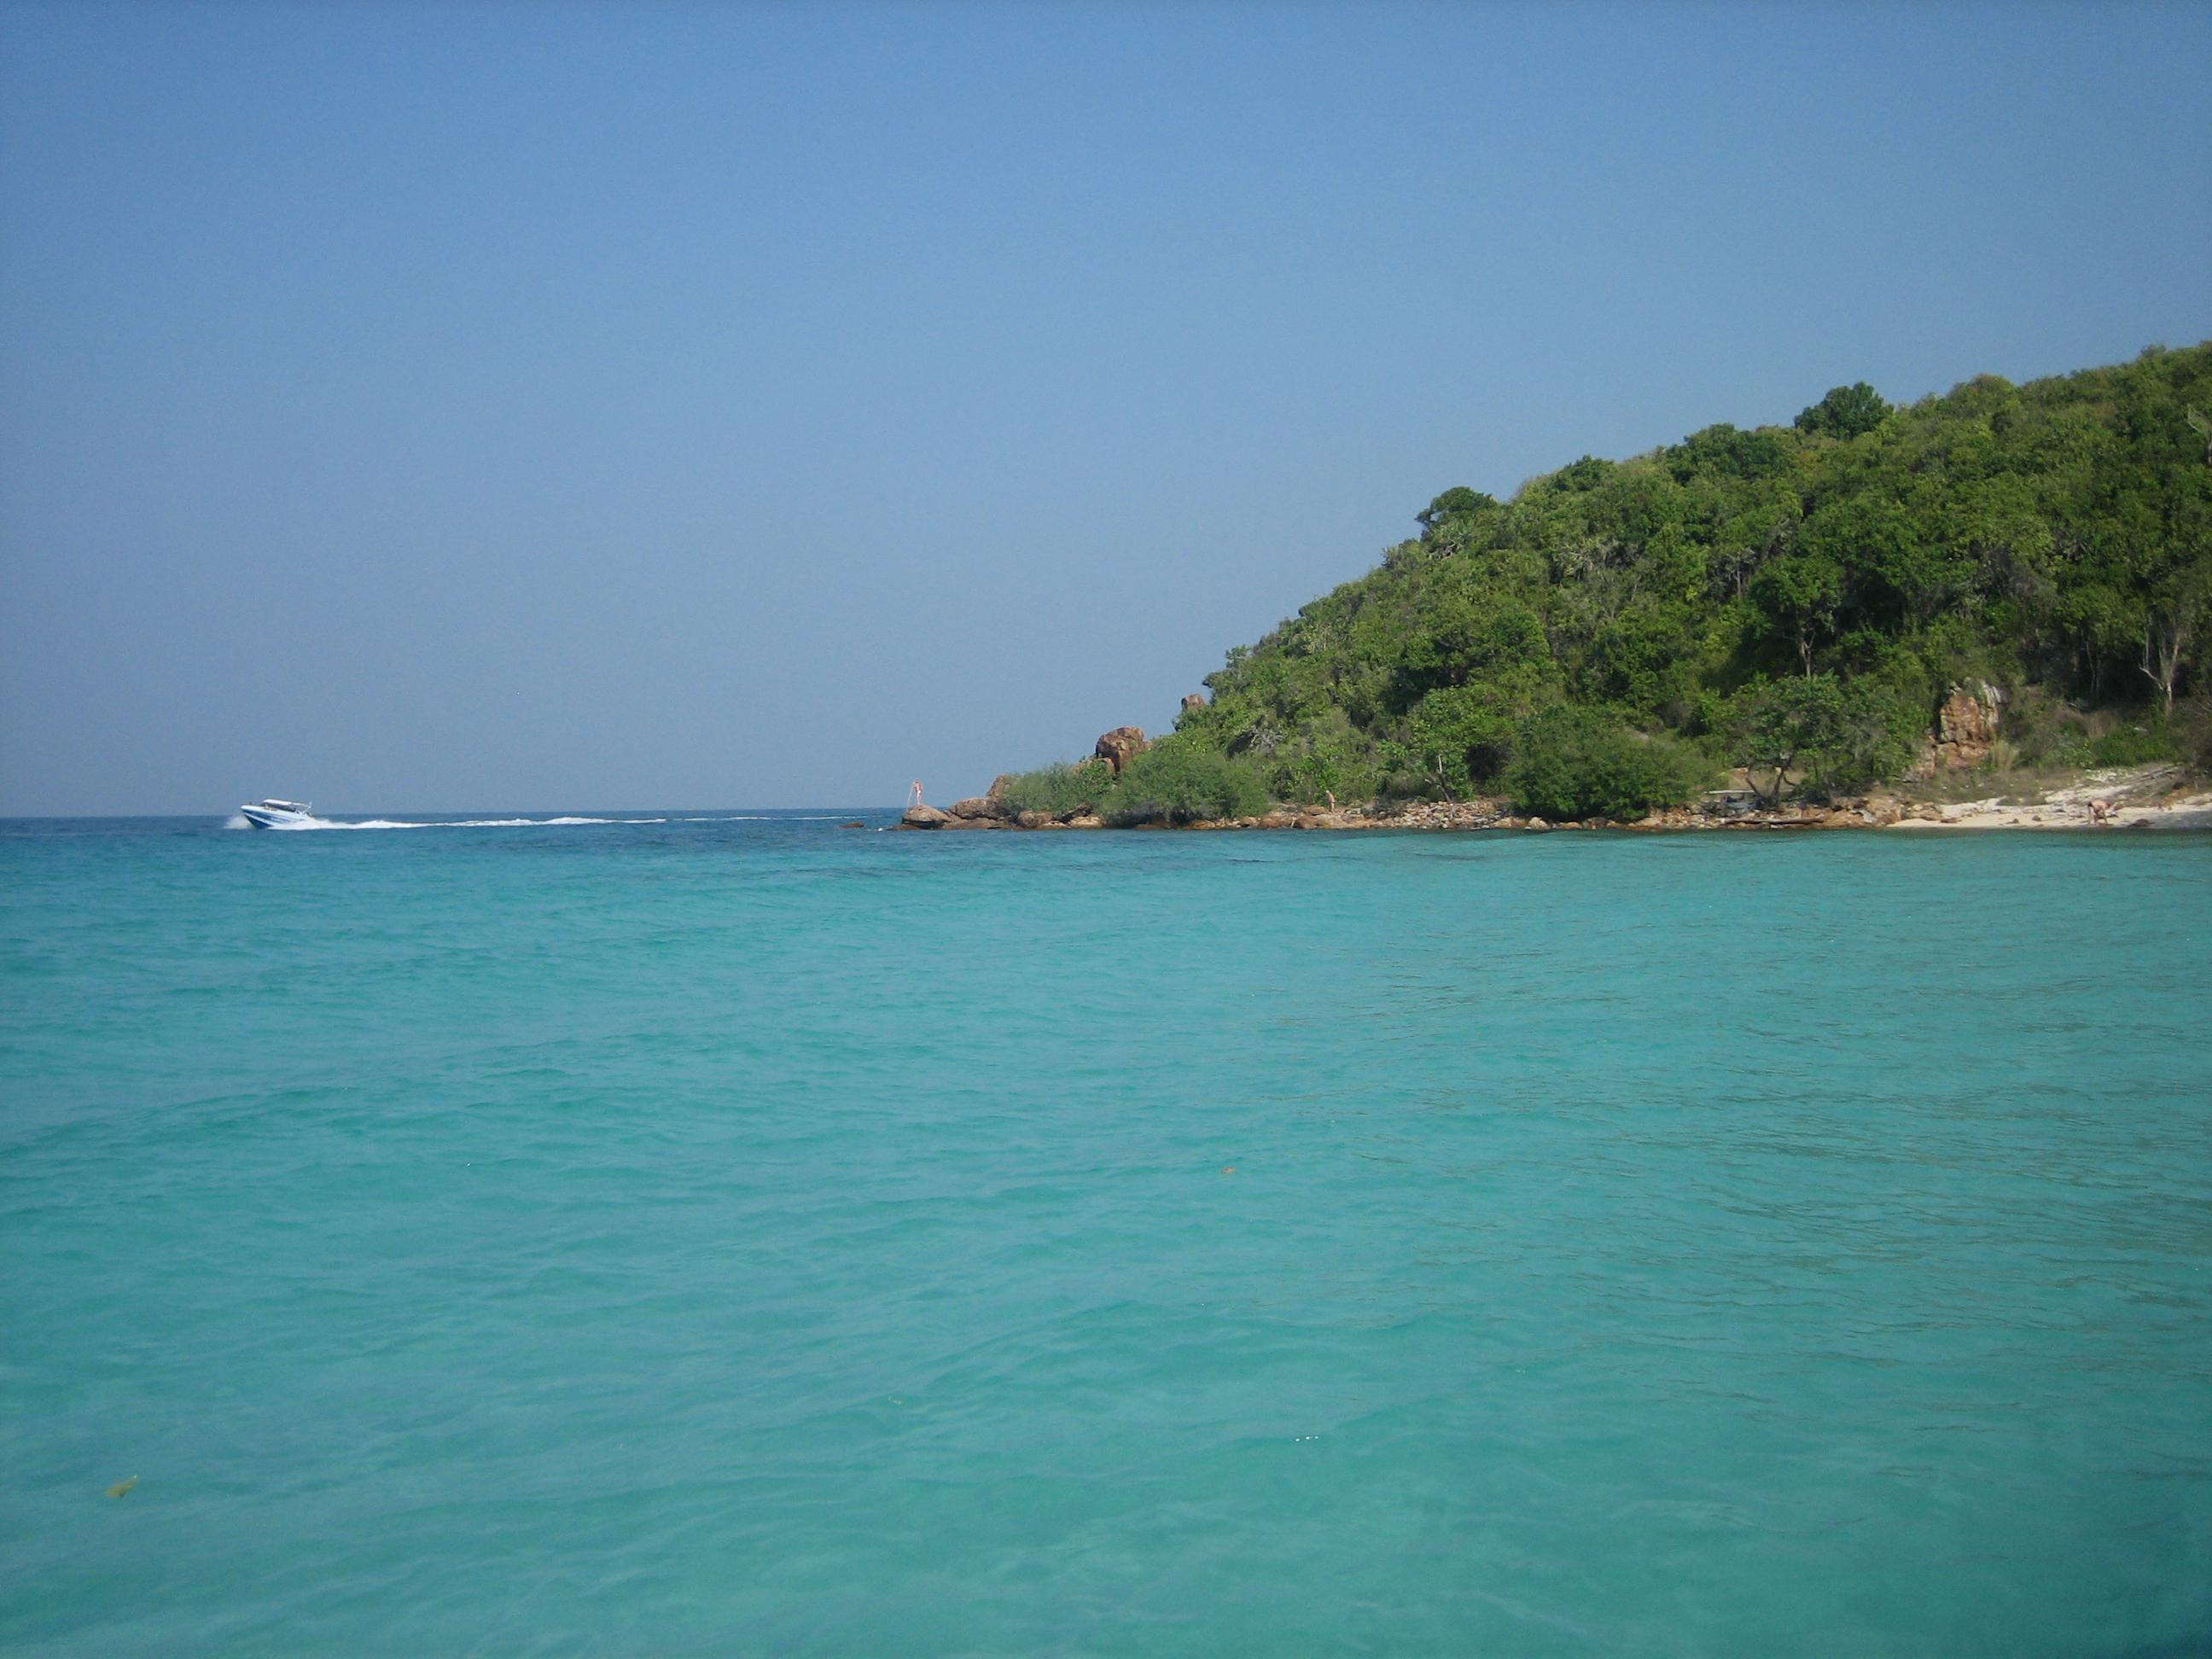 File:Ile de Koh Larn (Ile de corail).jpg - Wikimedia Commons